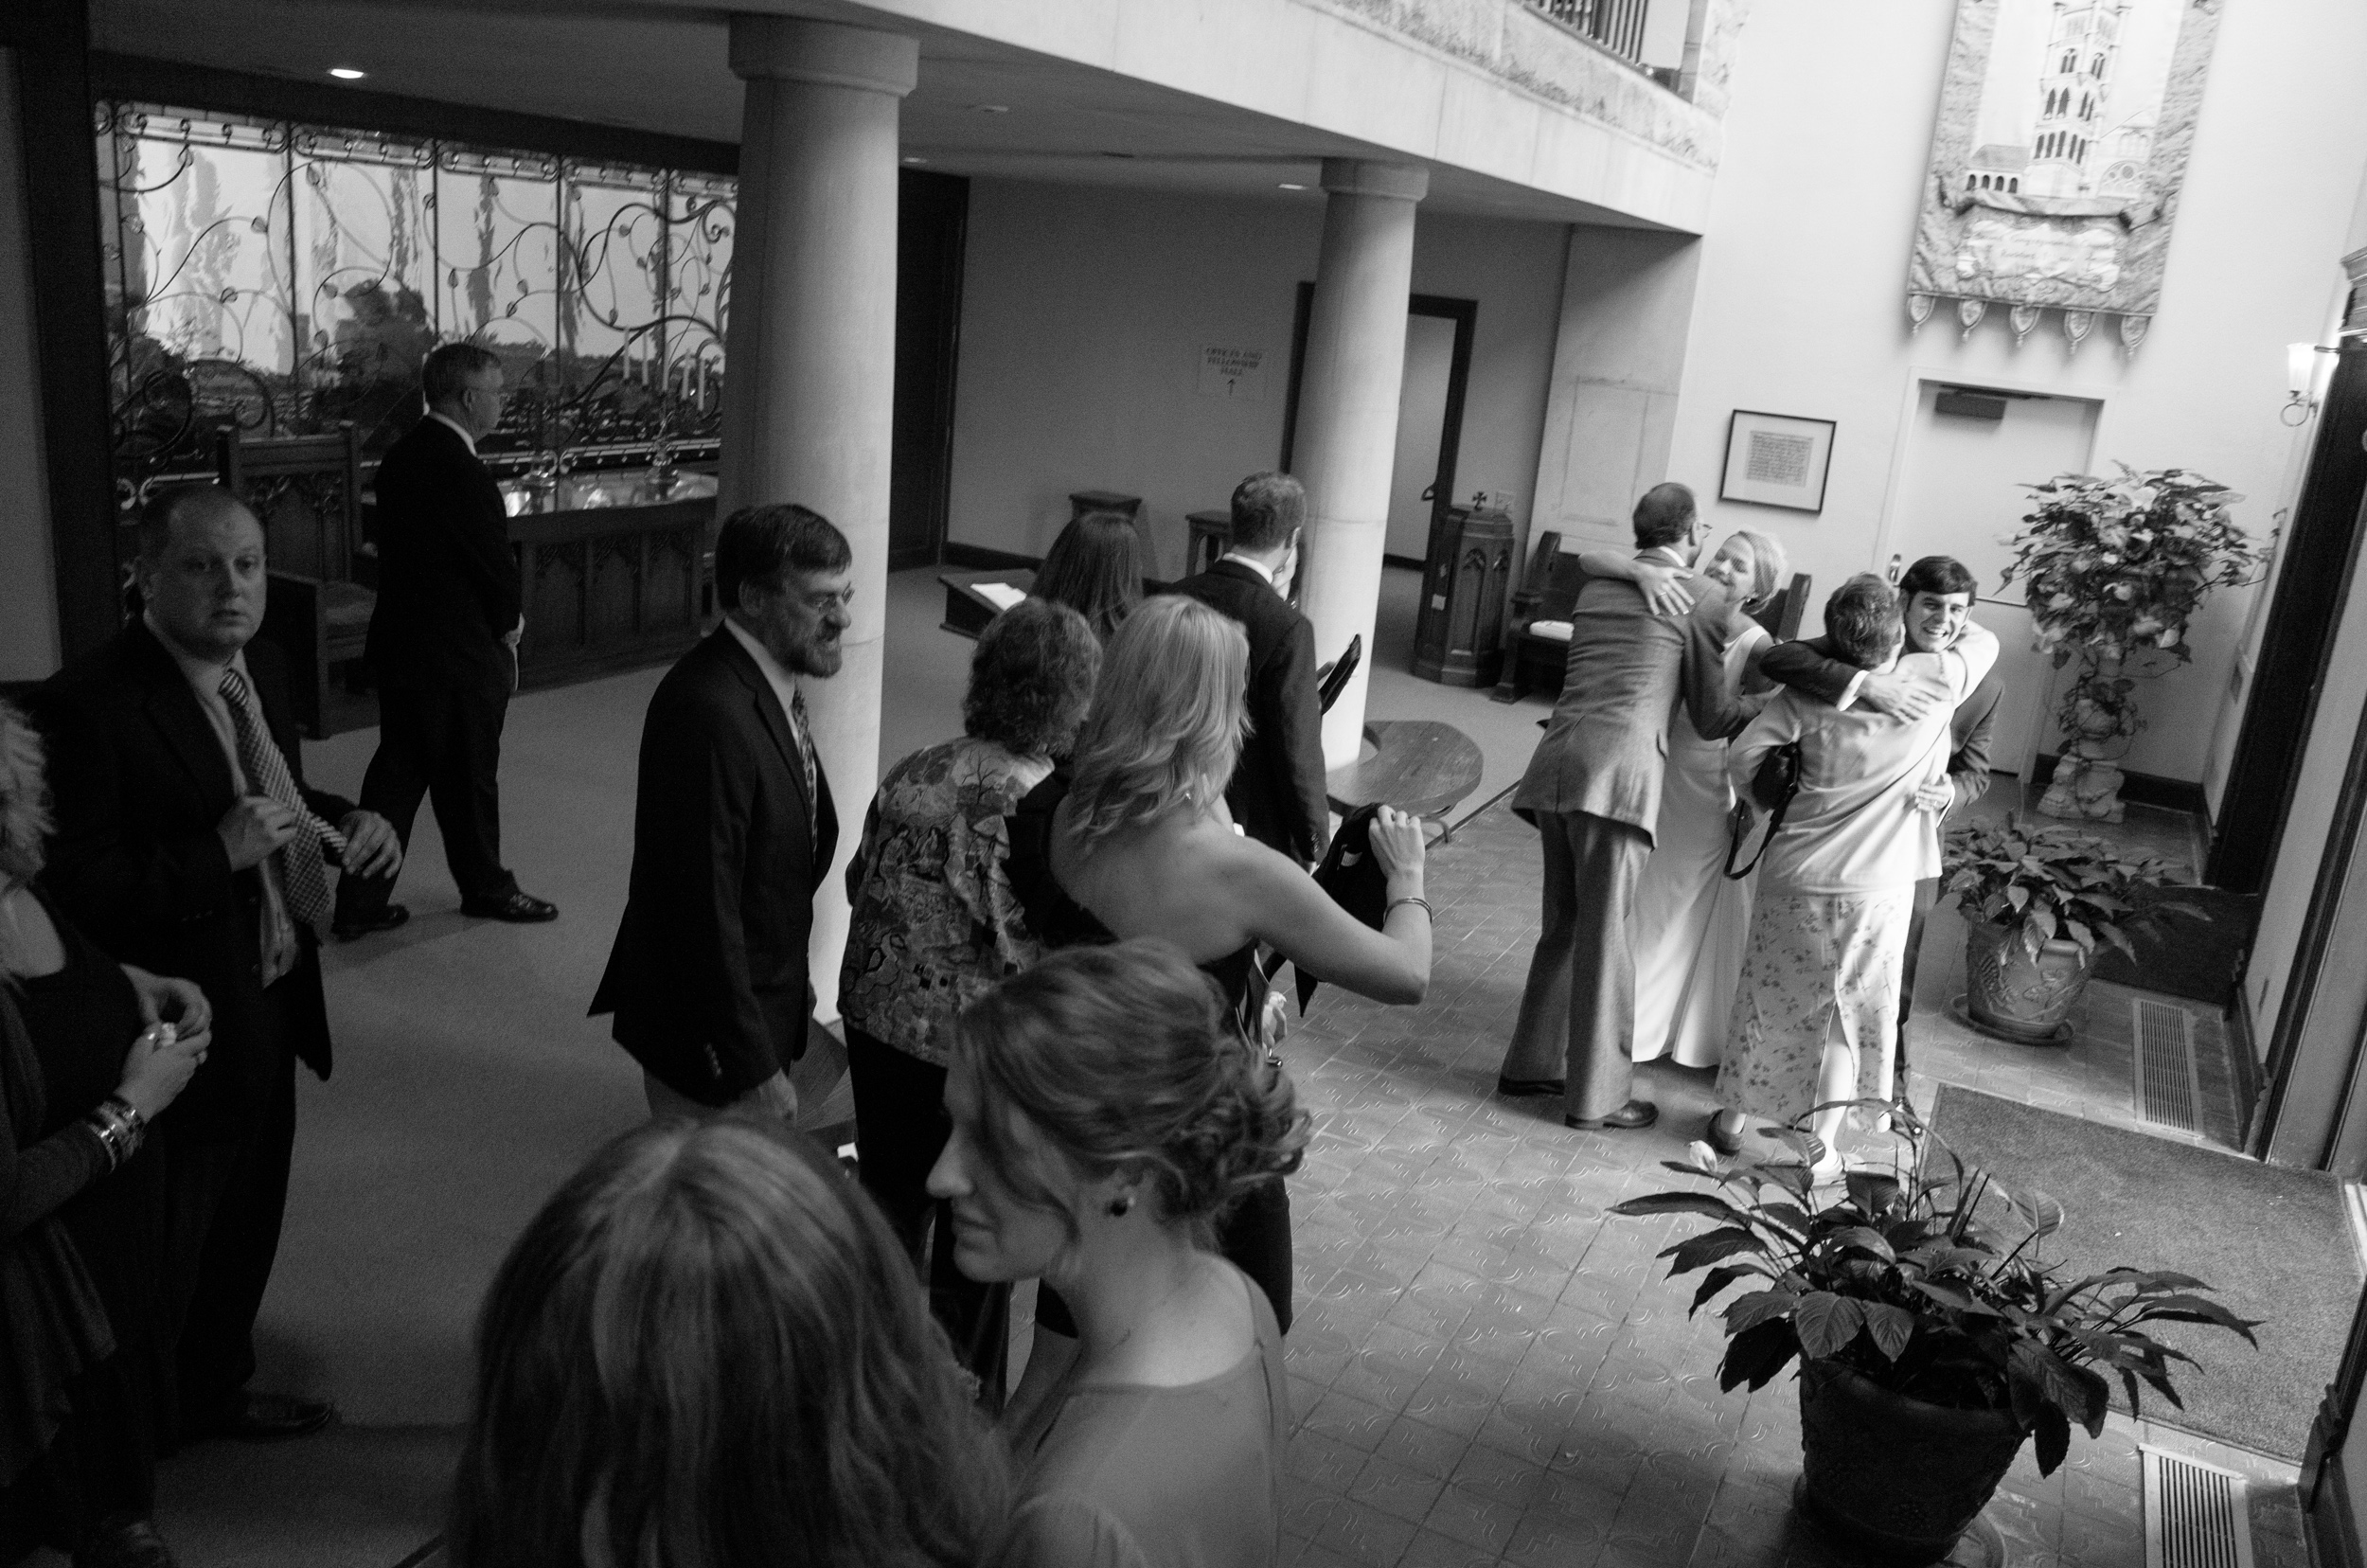 10-05-2013 maggie & adam wedding photography by brian milo-138.jpg